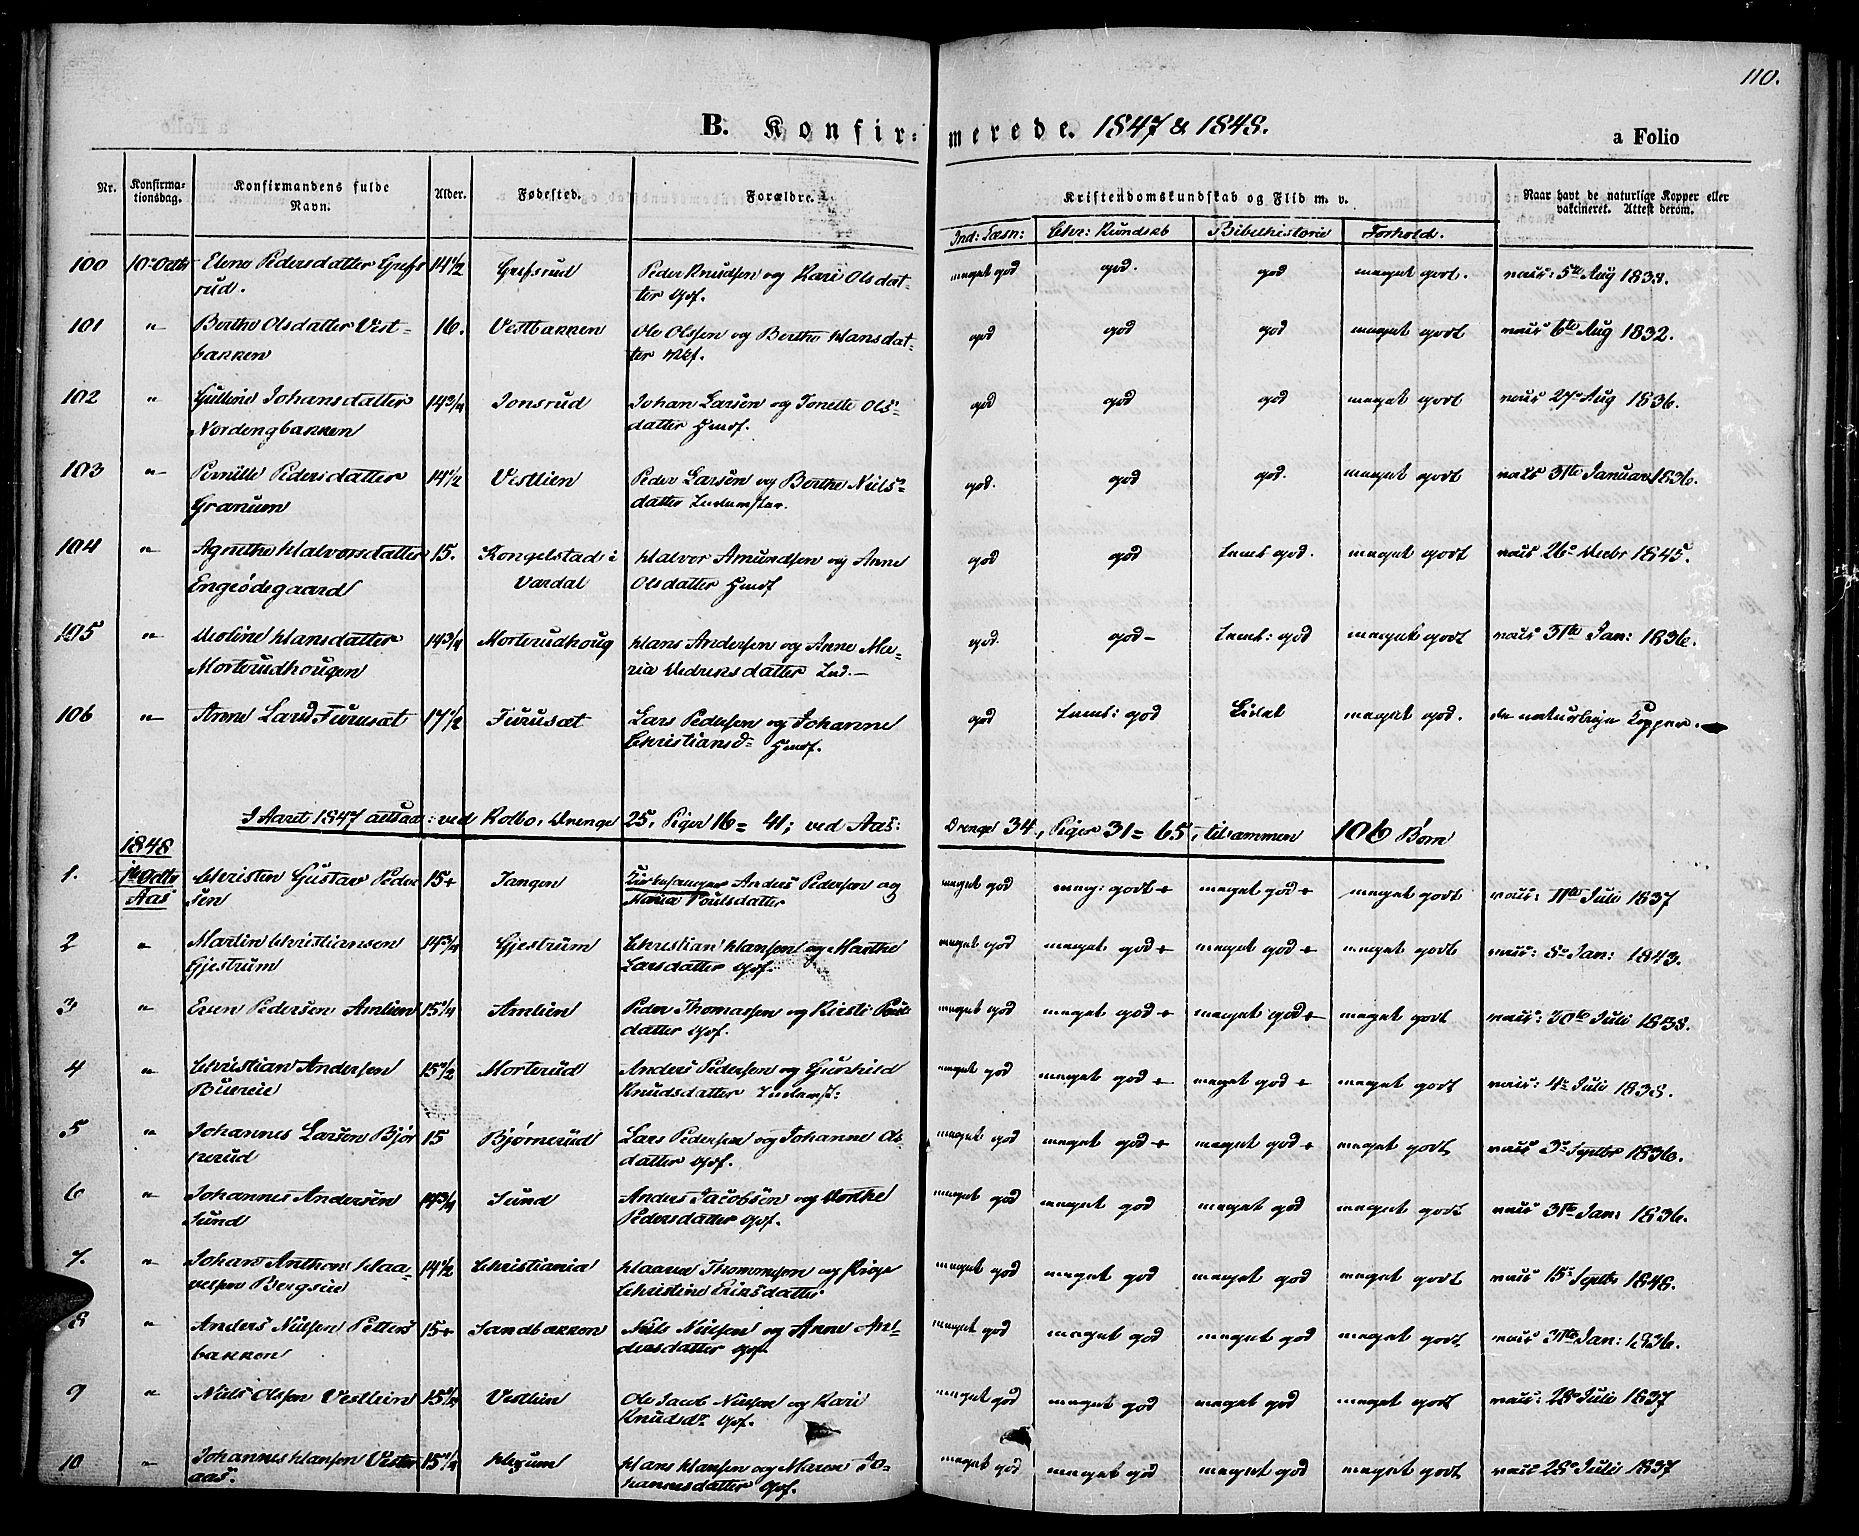 SAH, Vestre Toten prestekontor, H/Ha/Haa/L0004: Ministerialbok nr. 4, 1844-1849, s. 110